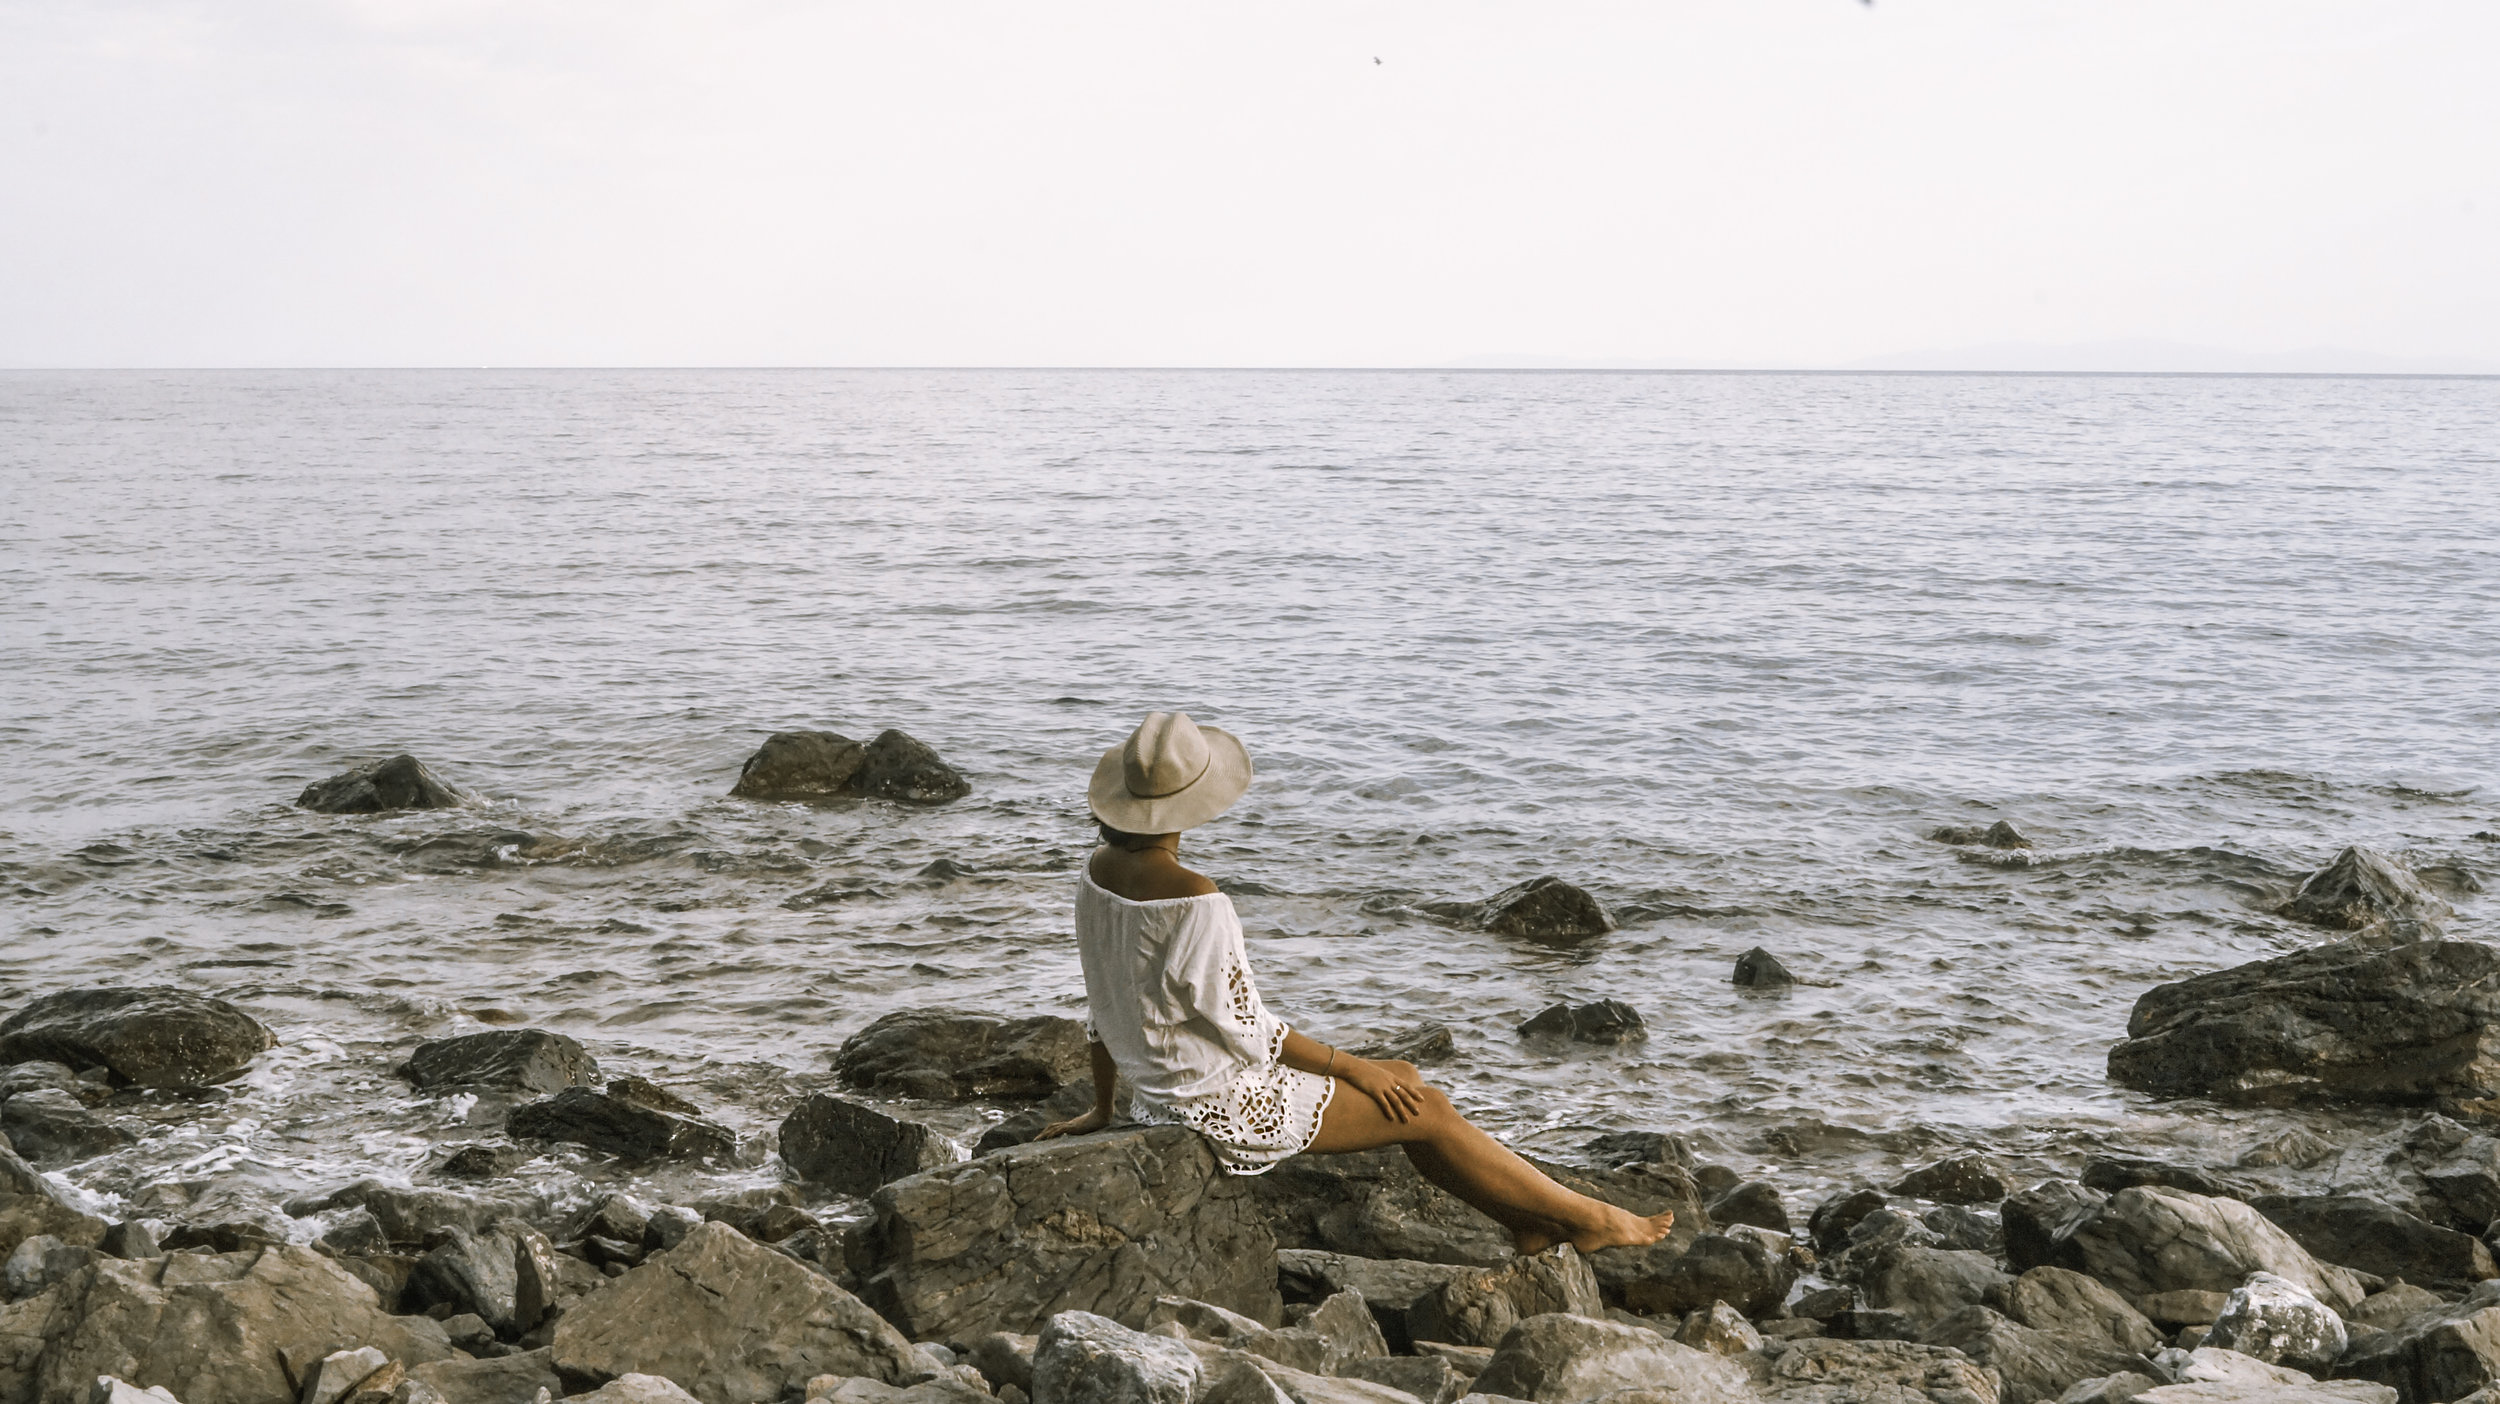 Monte Argentario, Tuscany Coast - Beach Vibes 7 - CocoBay x illumelation.jpg